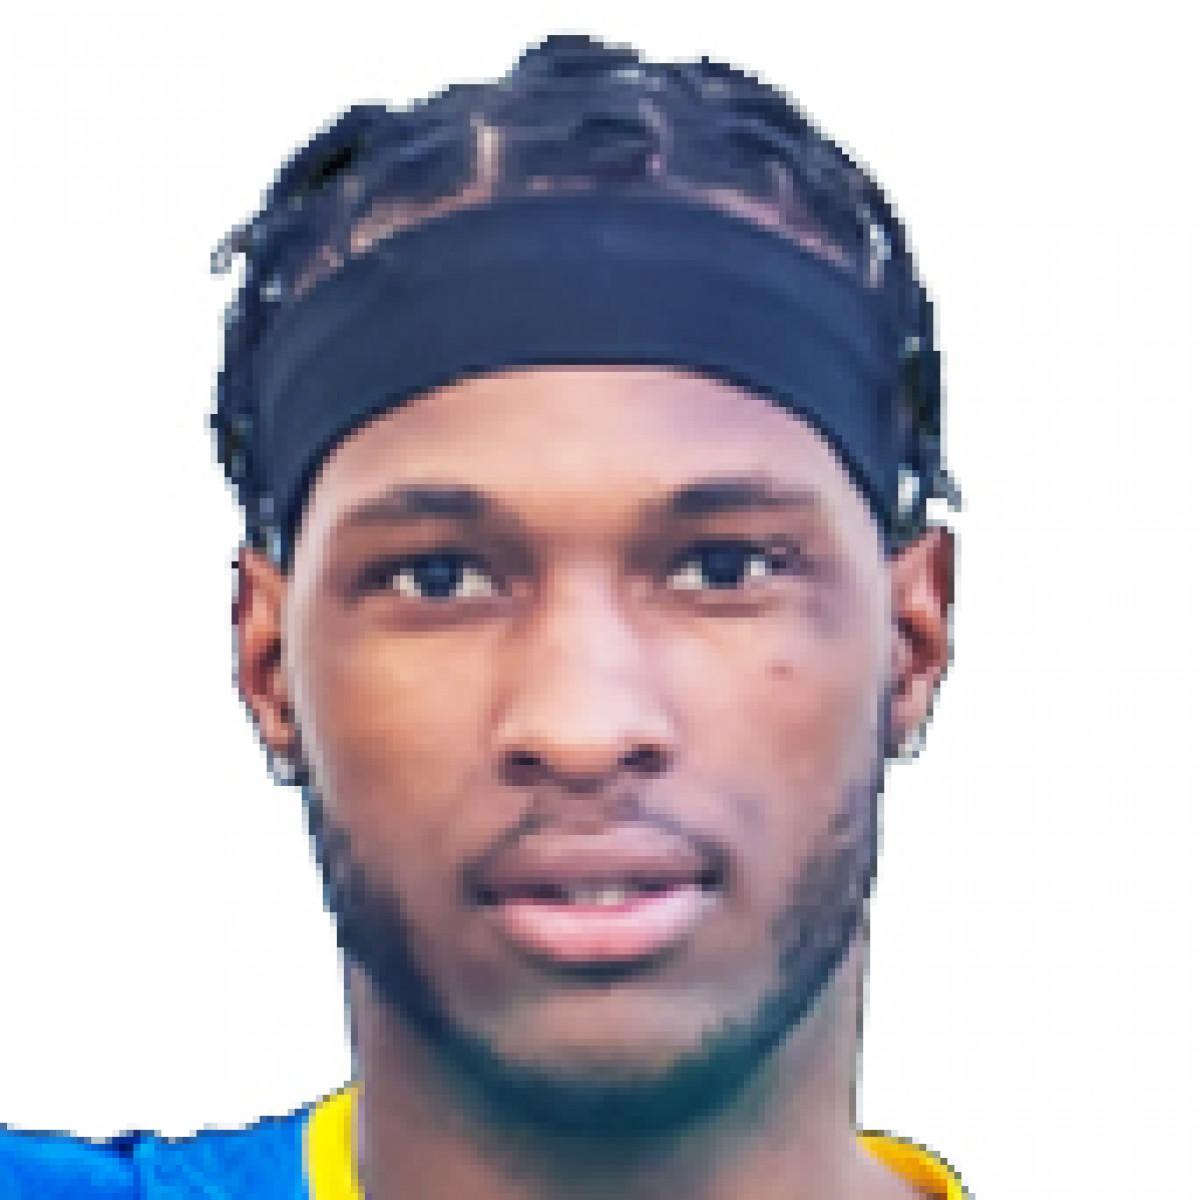 Rashid Gaston